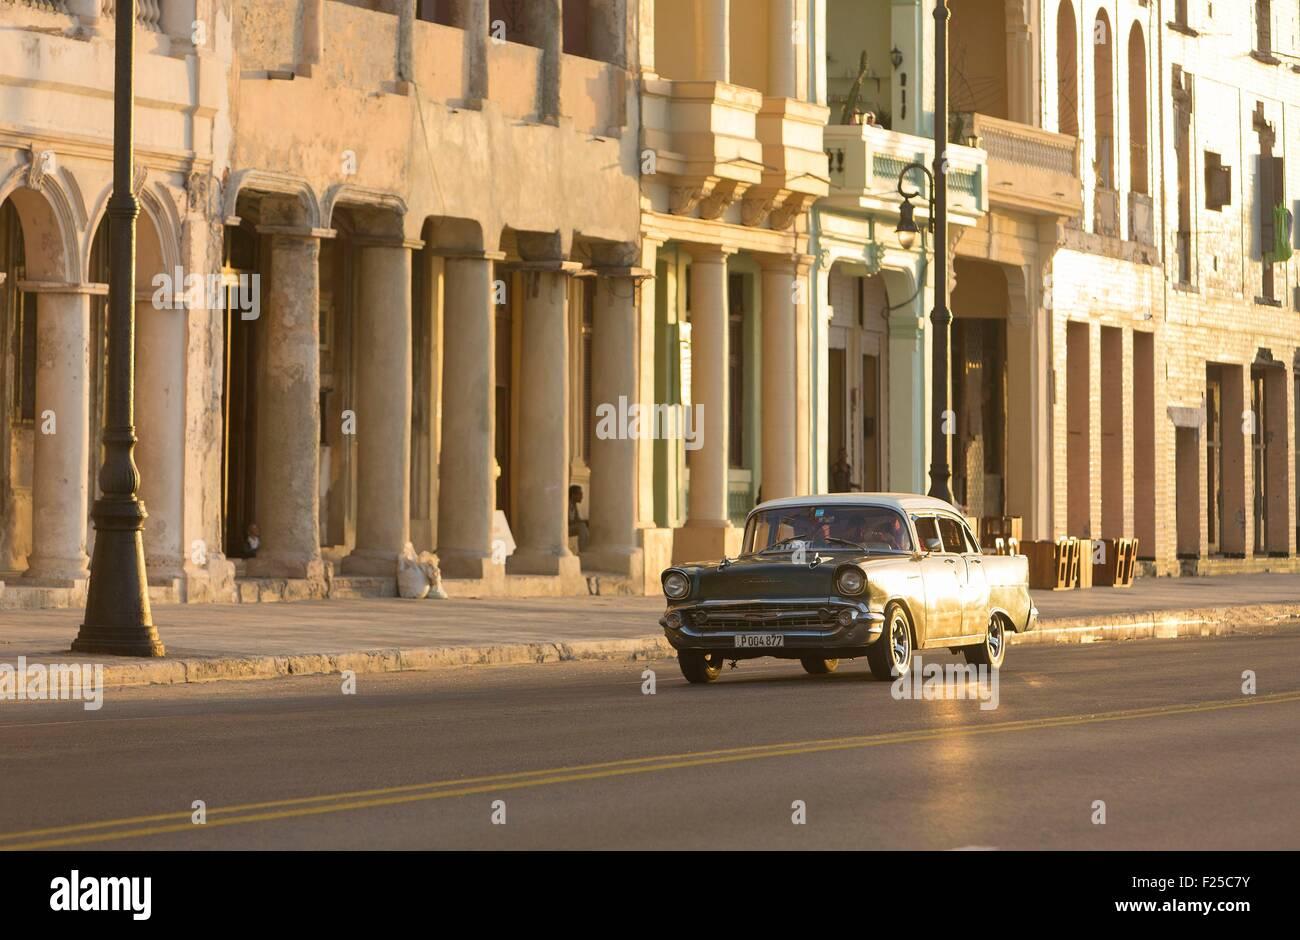 Kuba, Ciudad De La Habana Provinz, La Havanna, amerikanisches Auto am Malecon Stockbild